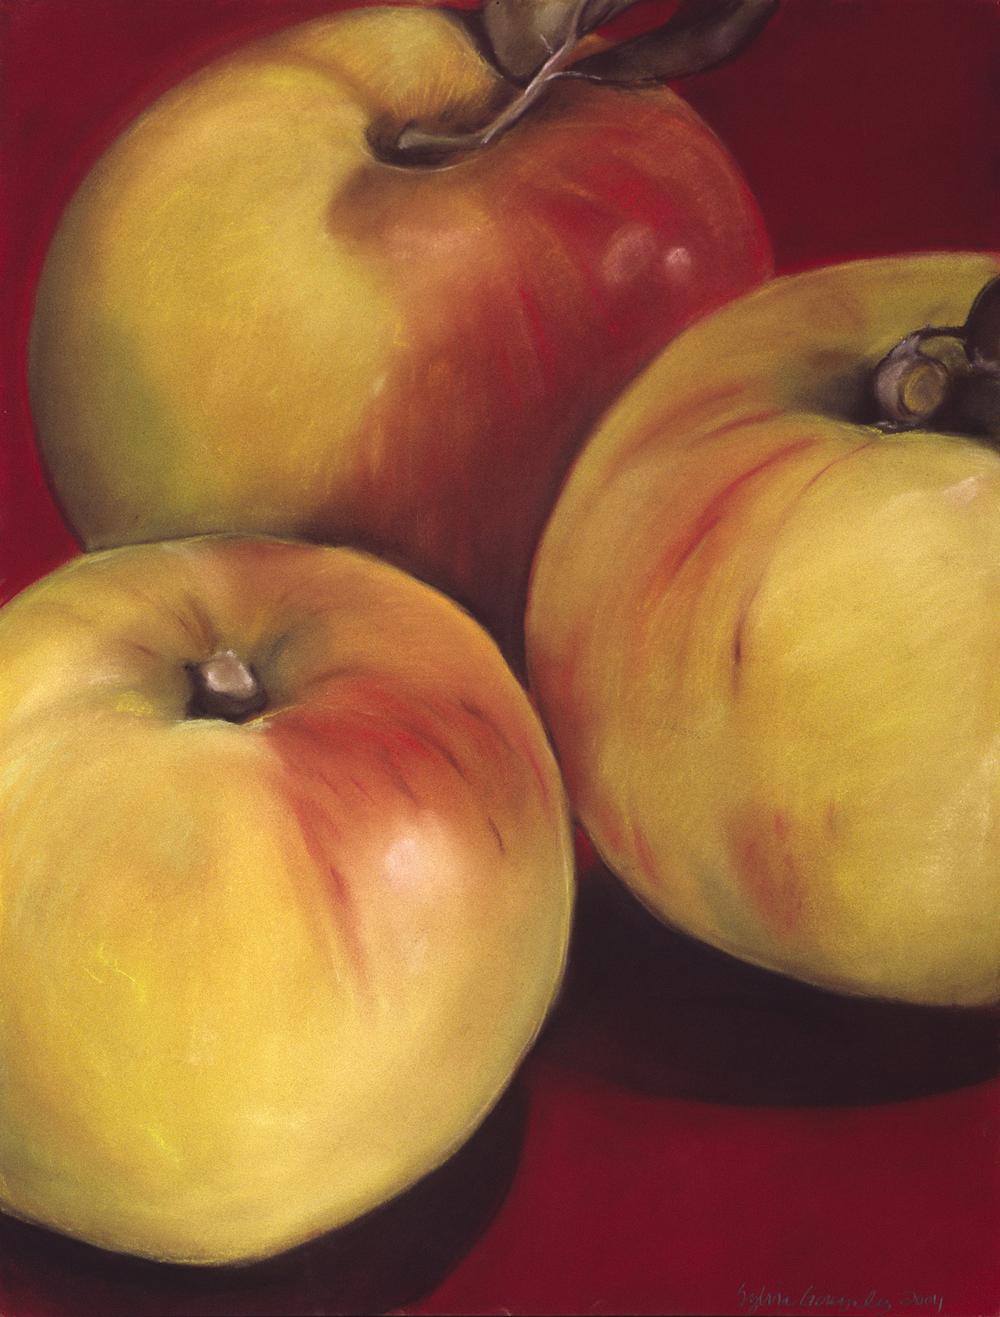 Apples # 4